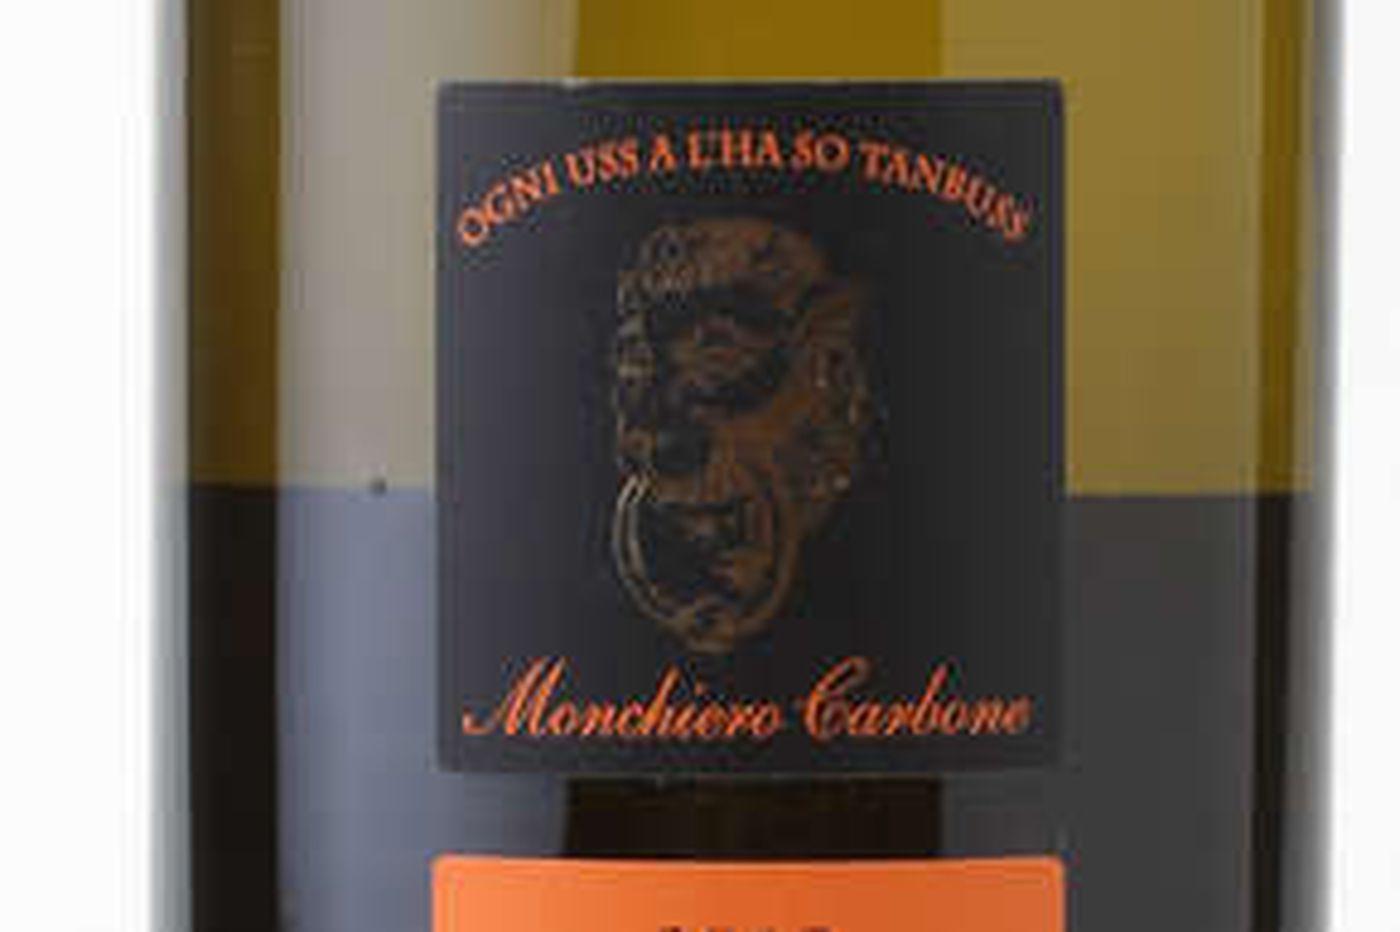 Drink: Monchiero Carbone Recit Roero Arneis 2013